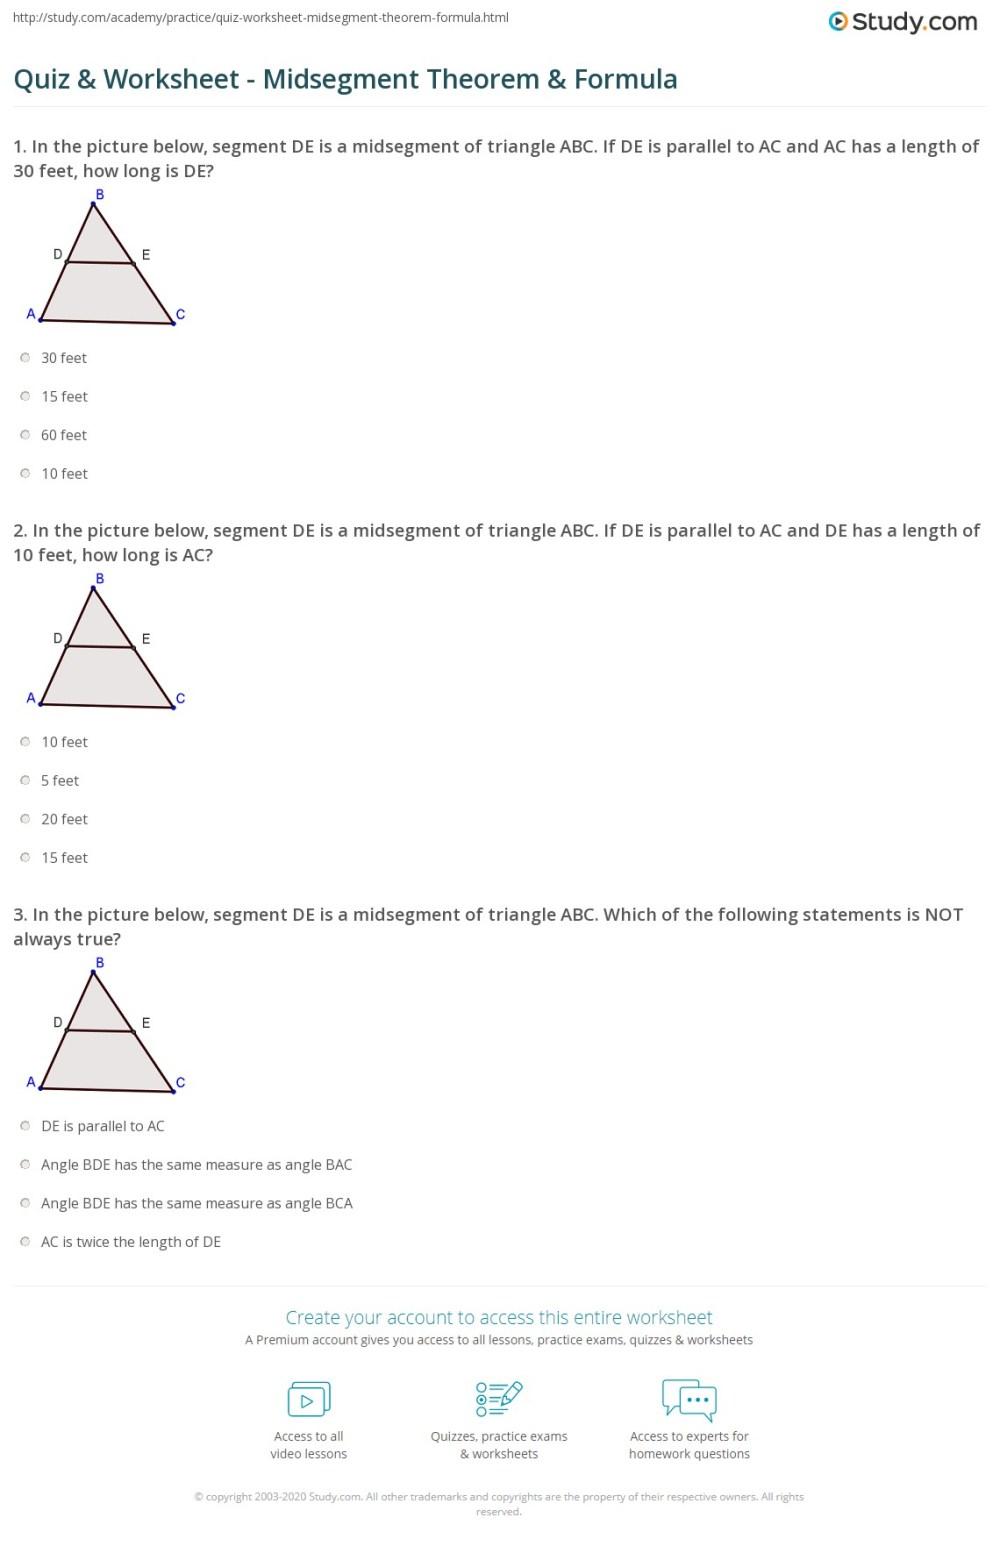 medium resolution of Quiz \u0026 Worksheet - Midsegment Theorem \u0026 Formula   Study.com